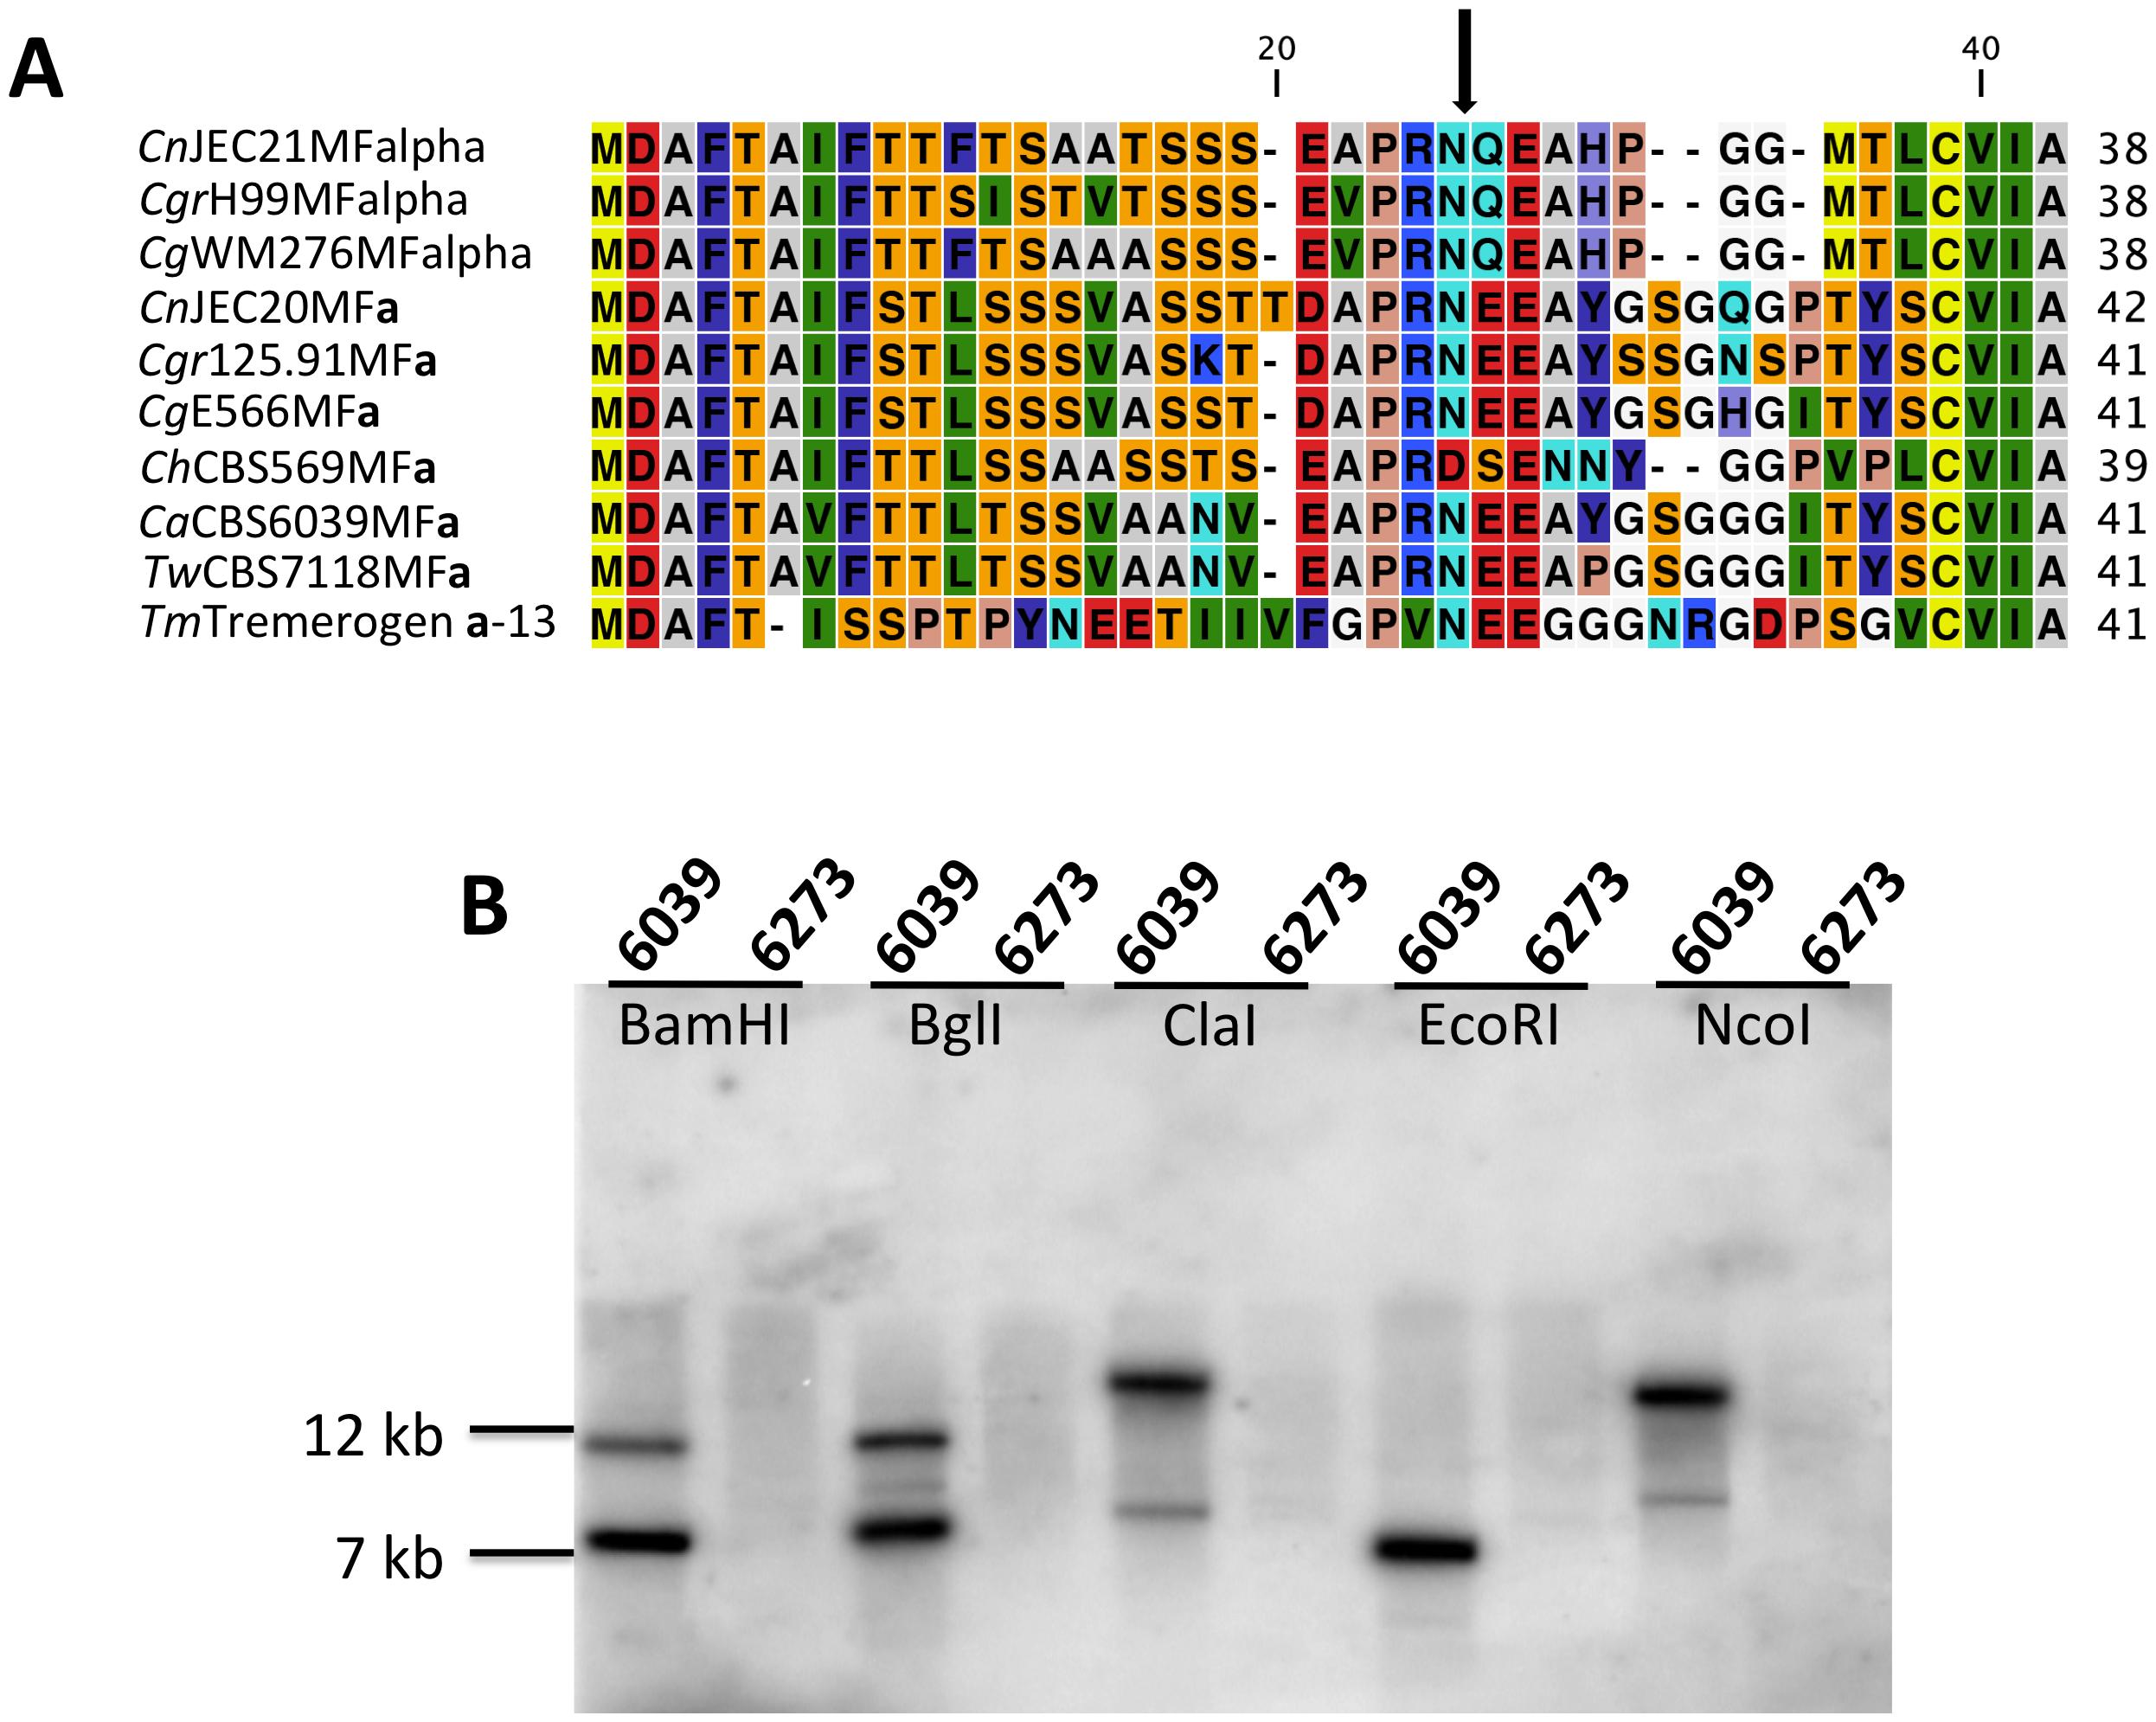 Analysis of the pheromone/receptor genes in <i>C. amylolentus</i>.